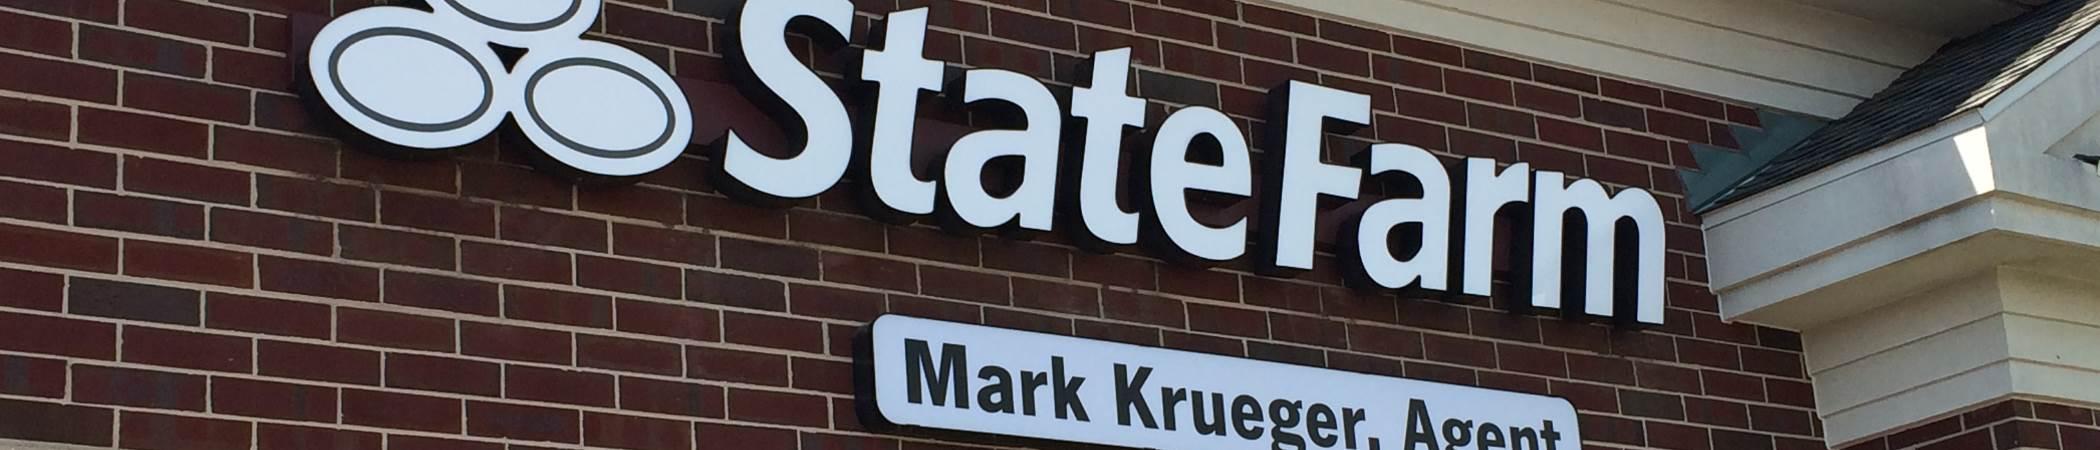 Mark Krueger State Farm Insurance in Lake in the Hills, IL | Home, Auto Insurance & more